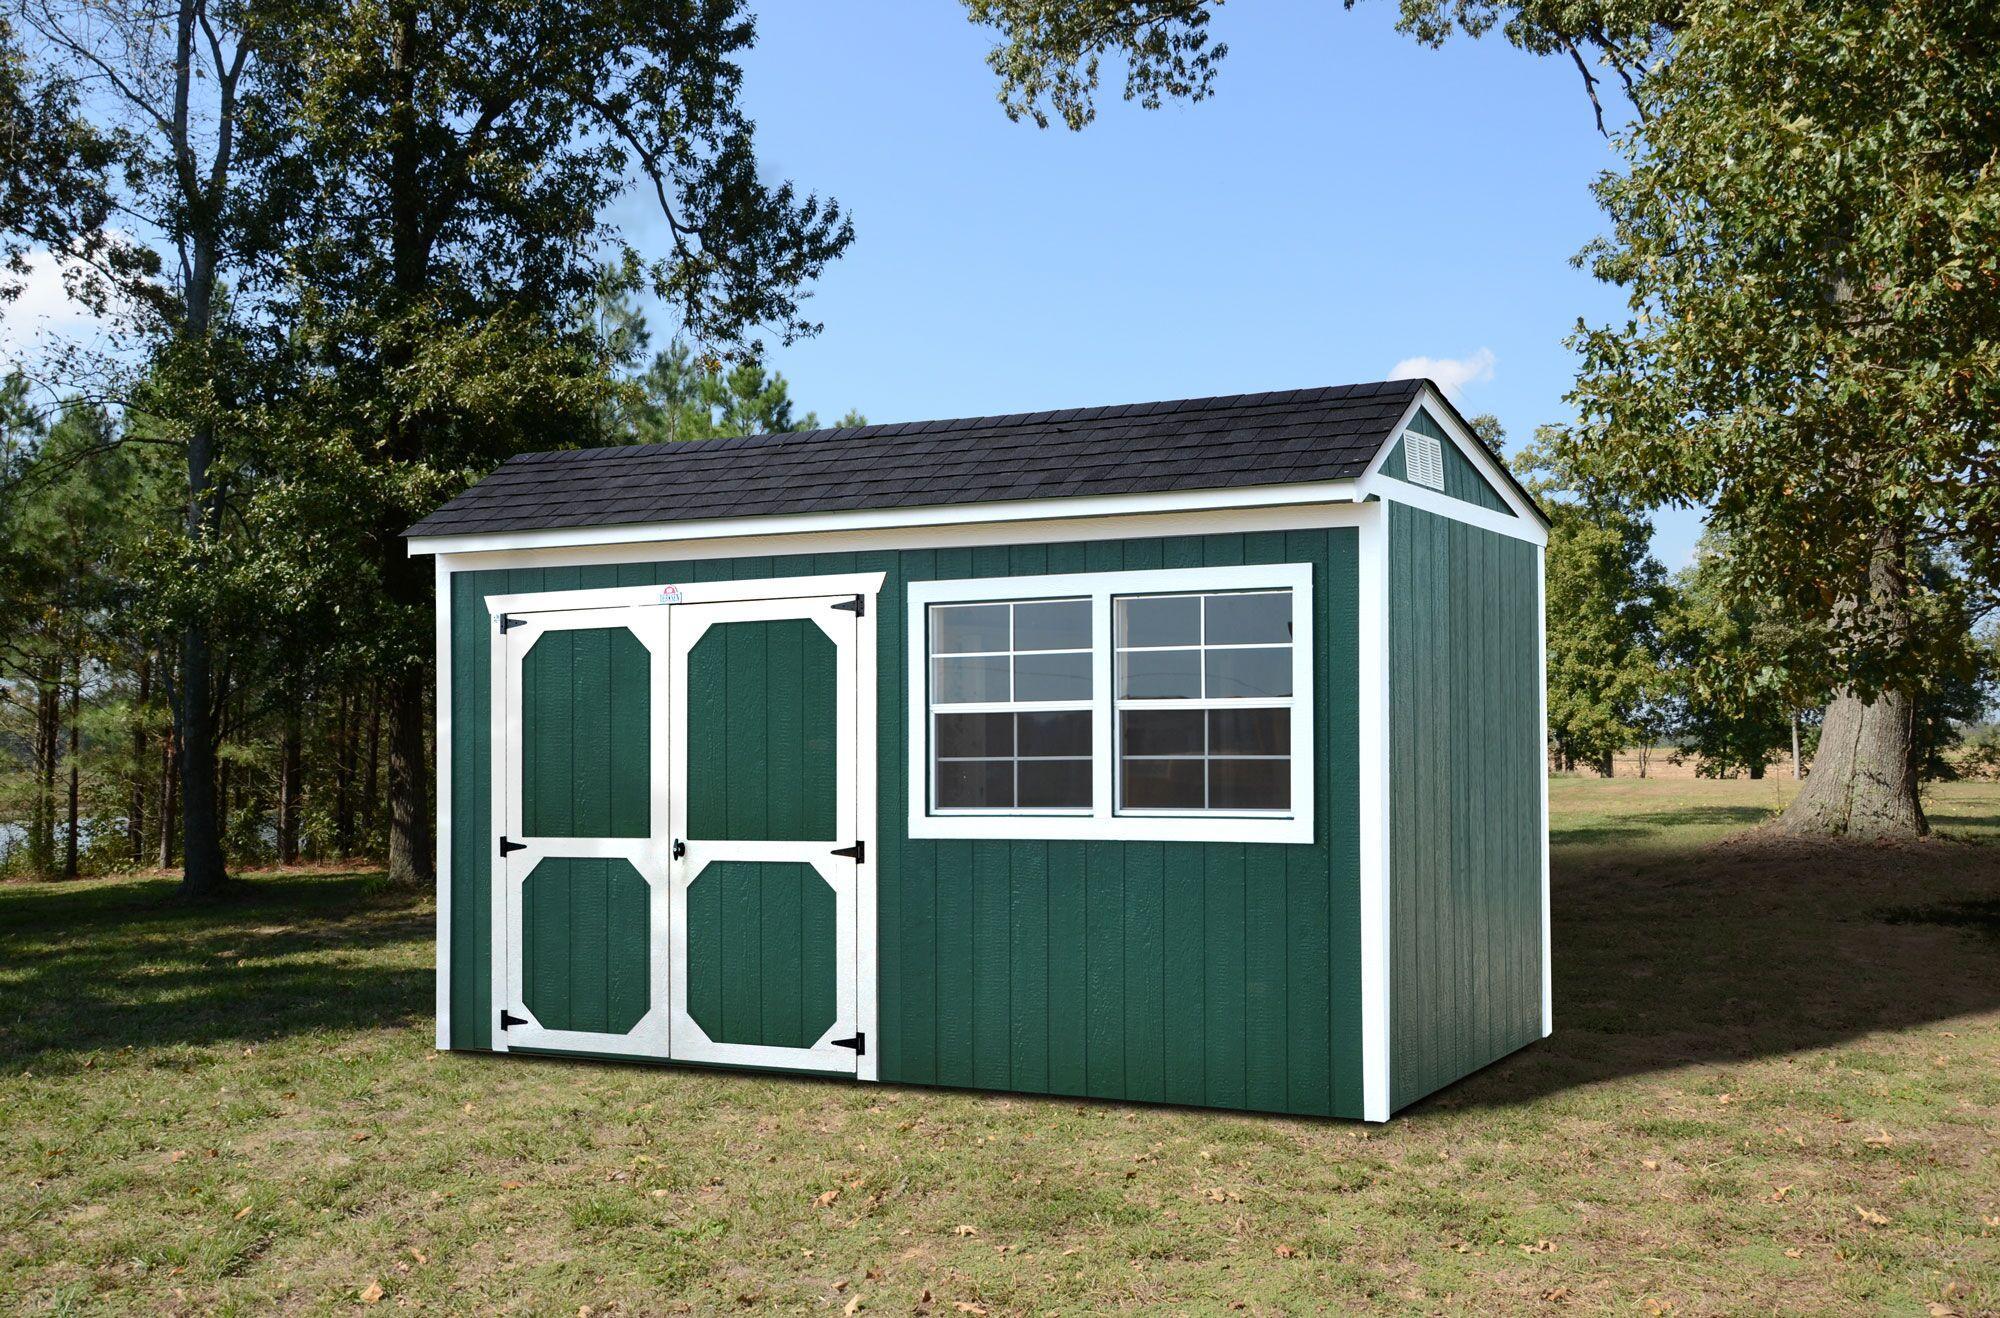 derksen painted sheds